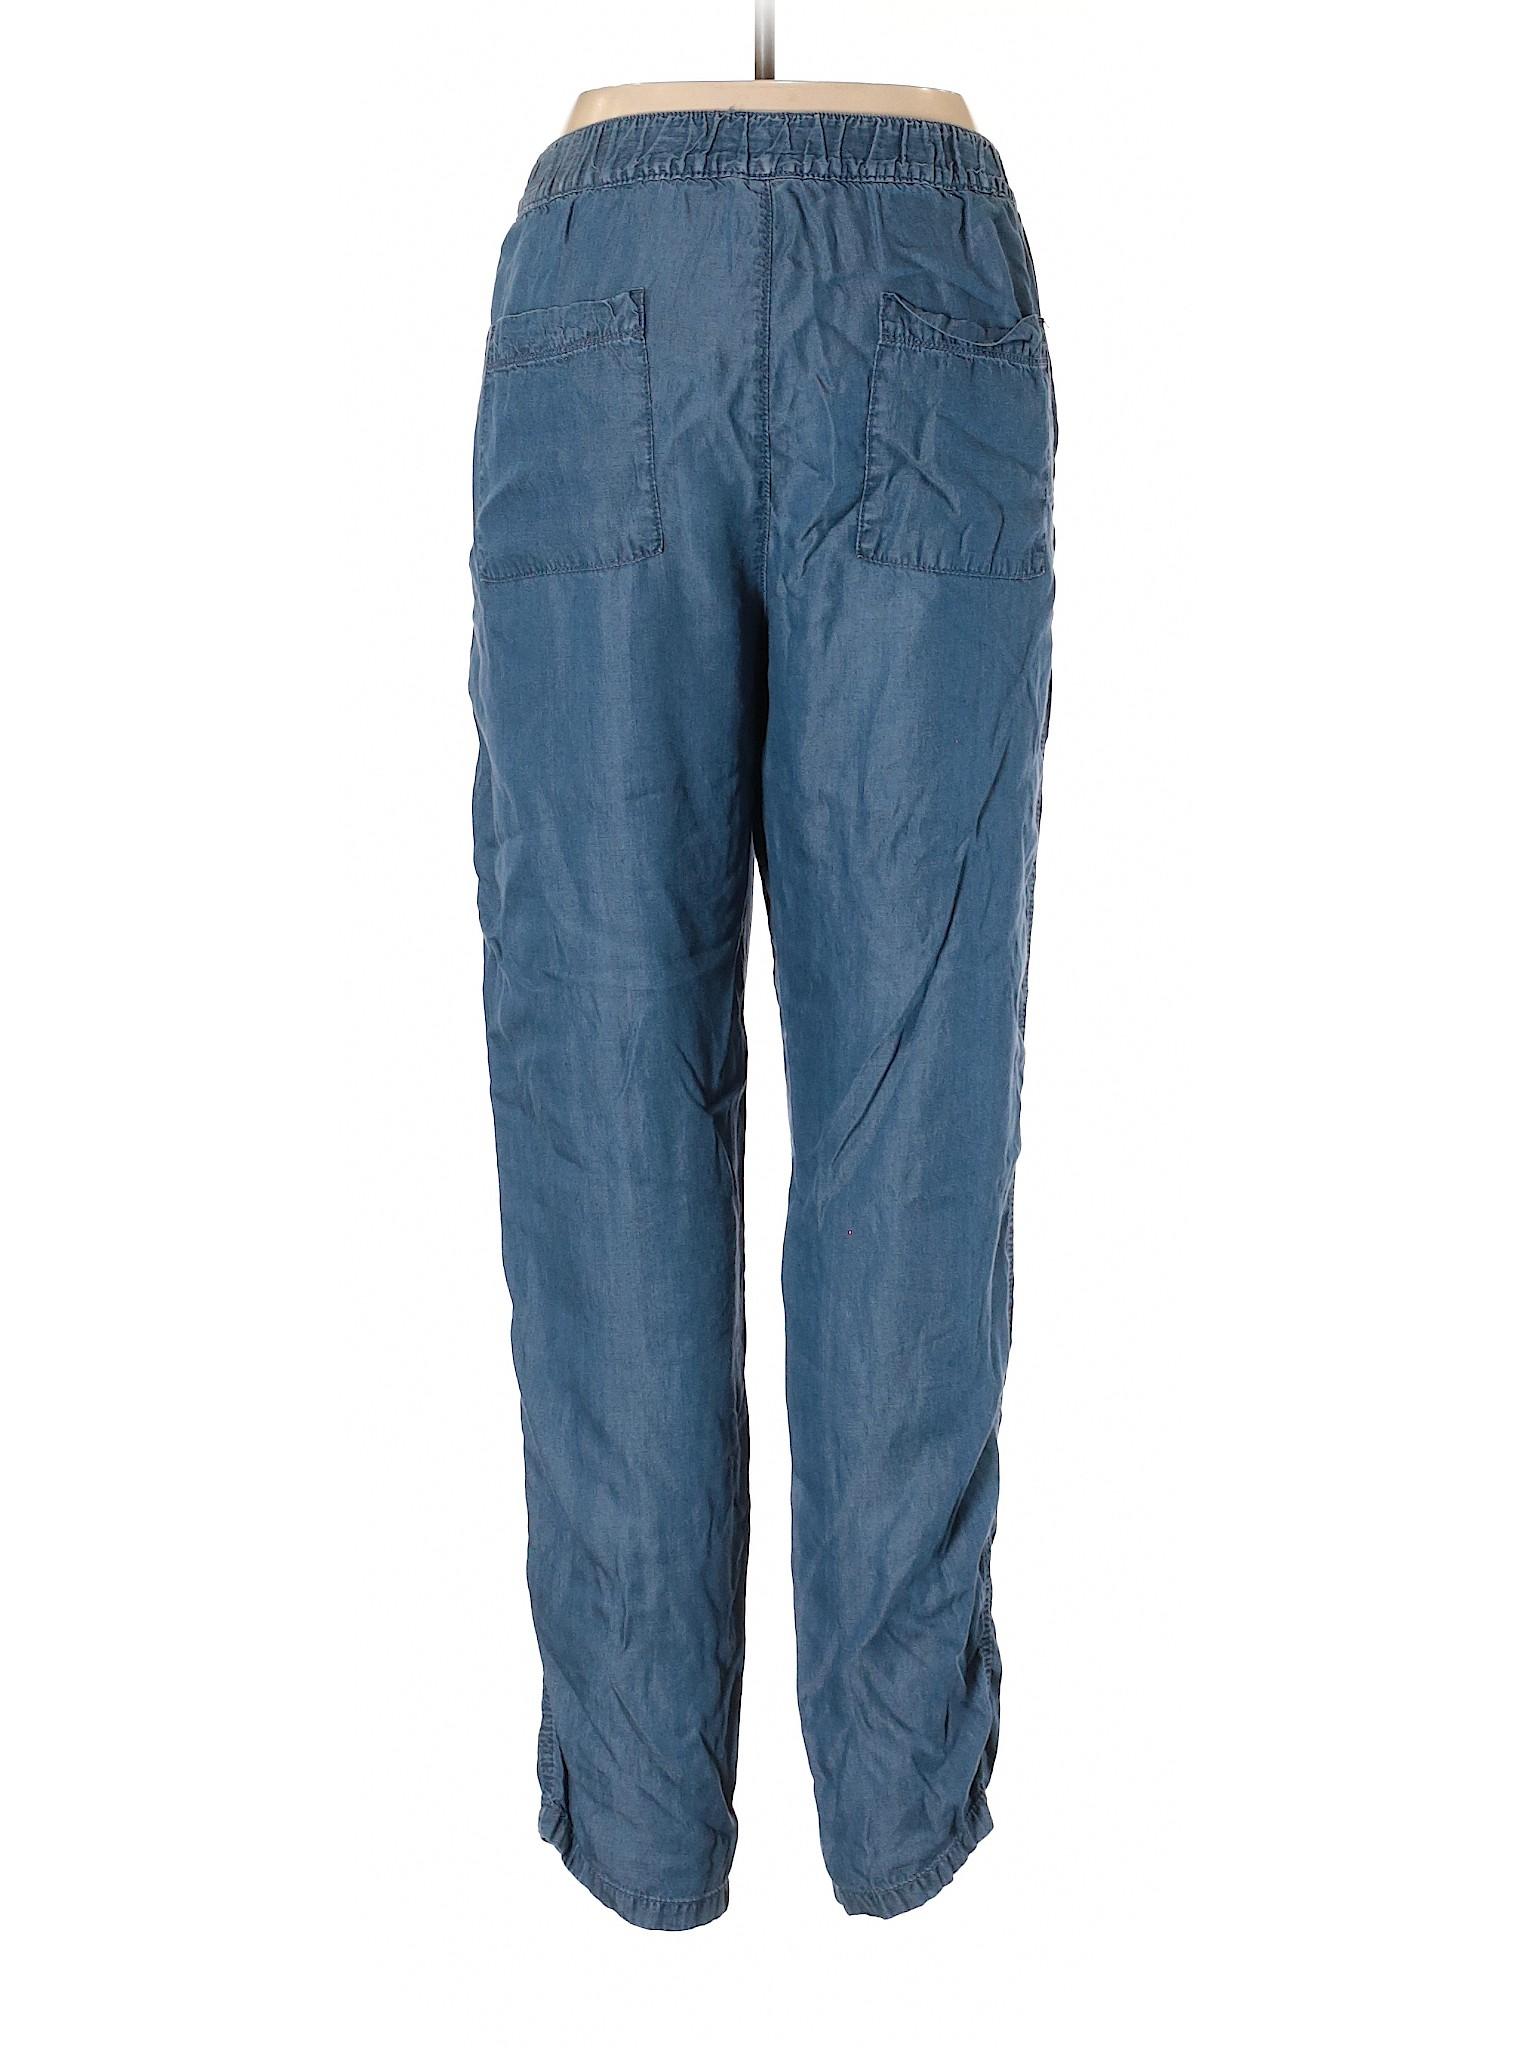 Joe Casual Fresh leisure Boutique Pants zqn6Axxa7R